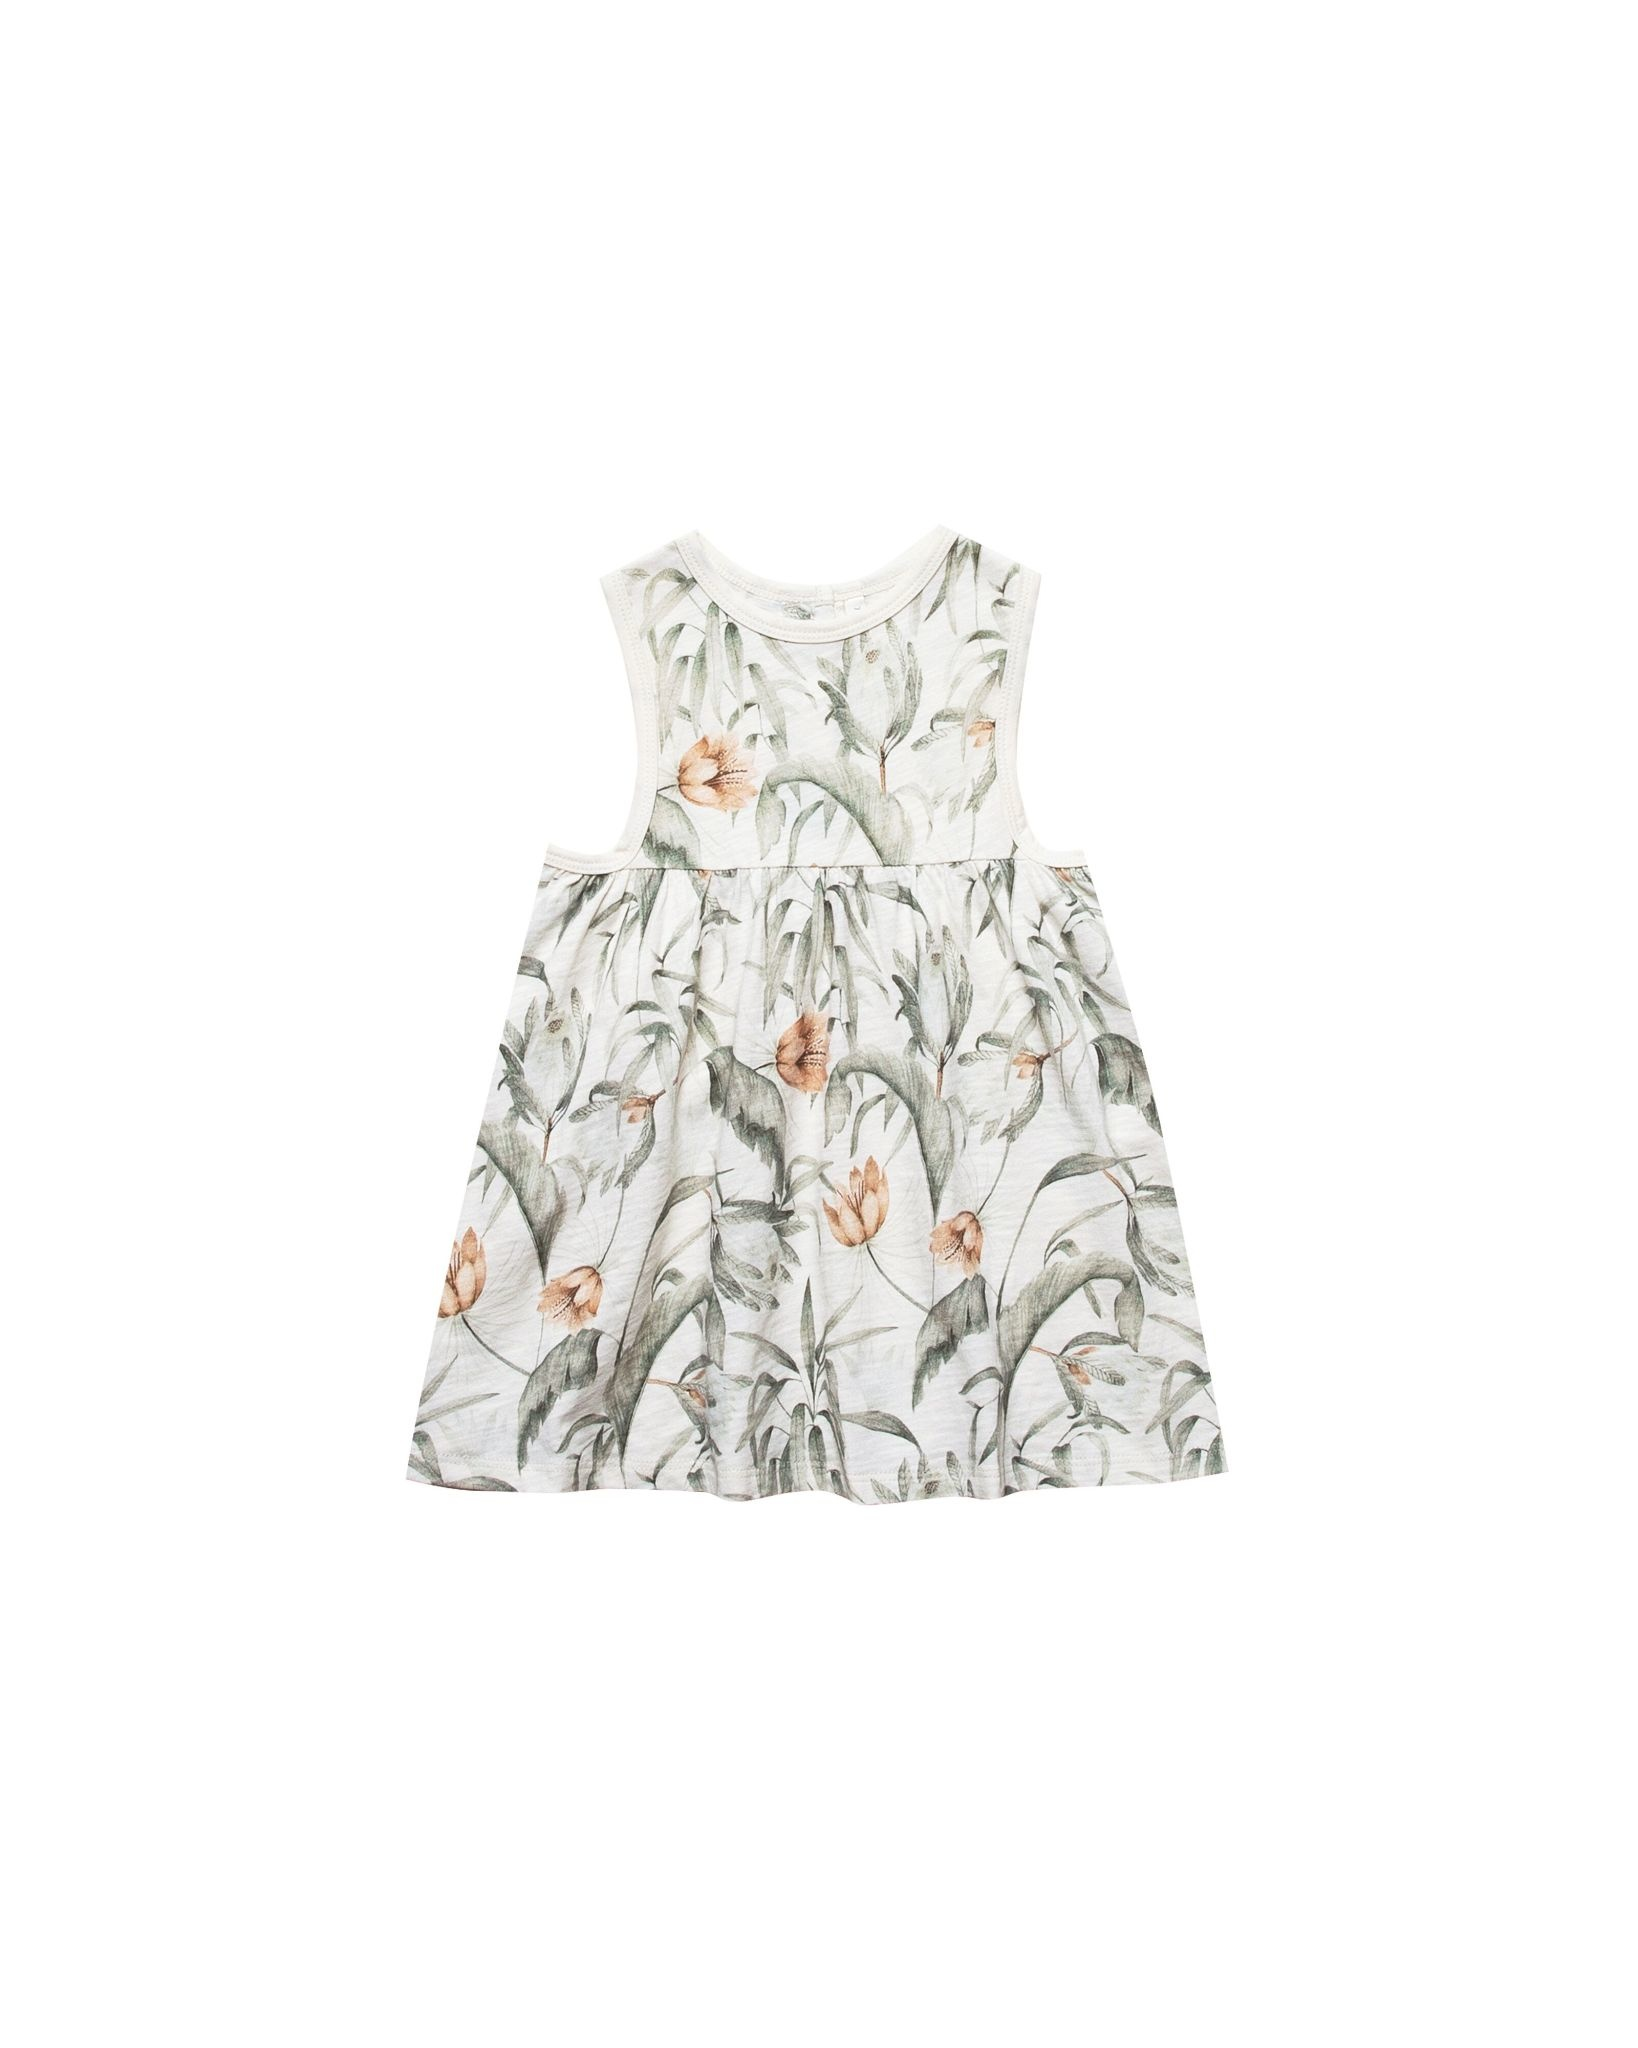 RYLEE AND CRU Baby Tropical Layla Mini Dress